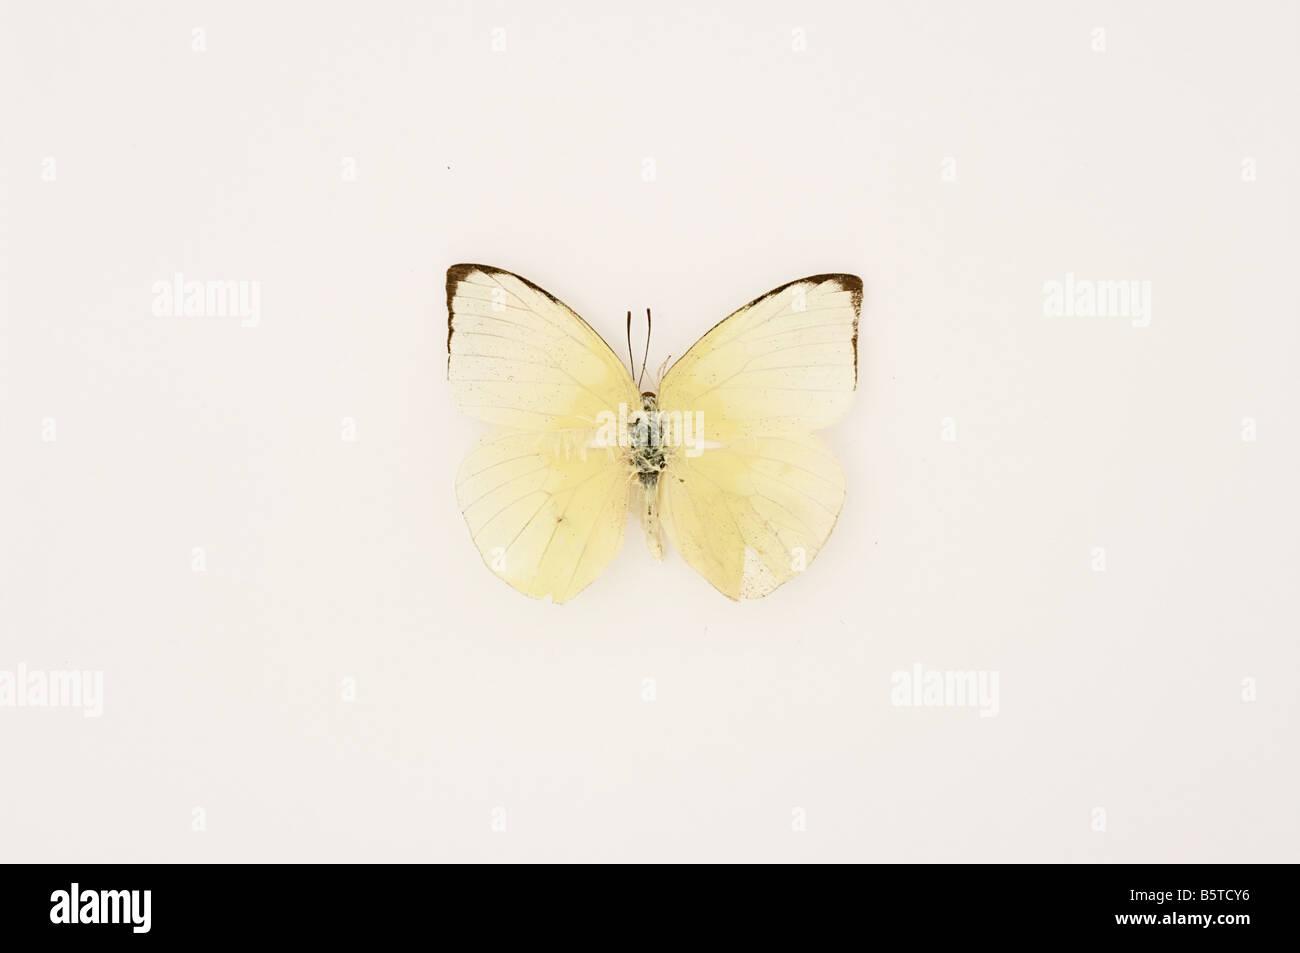 Bianco Giallo di farfalle tropicali insetti Immagini Stock